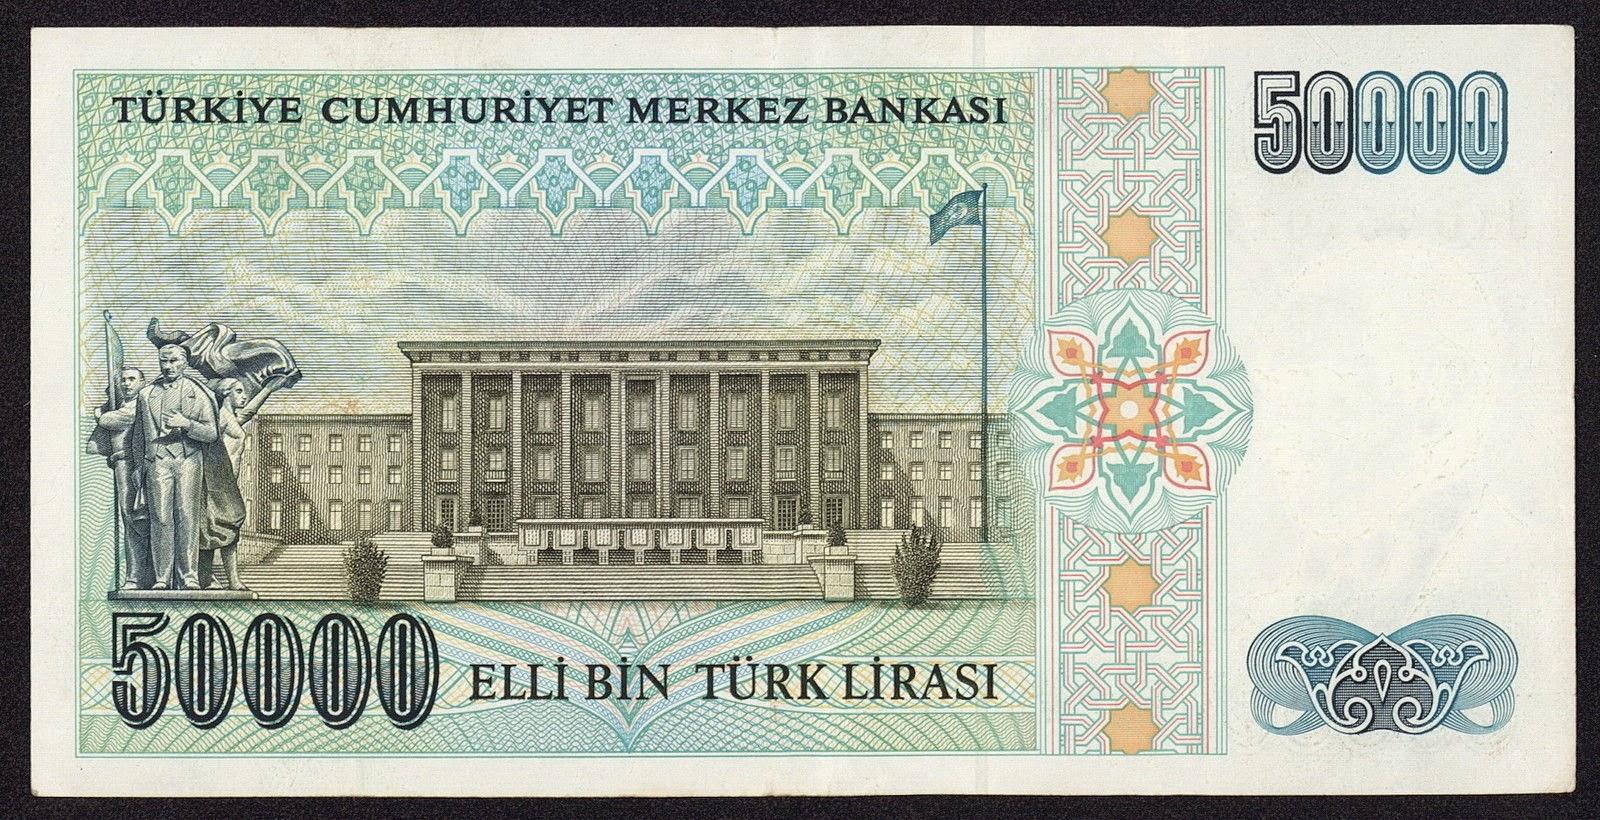 "Turkey currency money 50000 Turkish Lira ""Türk Lirasi"" note 1995 House of Parliament in Ankara"